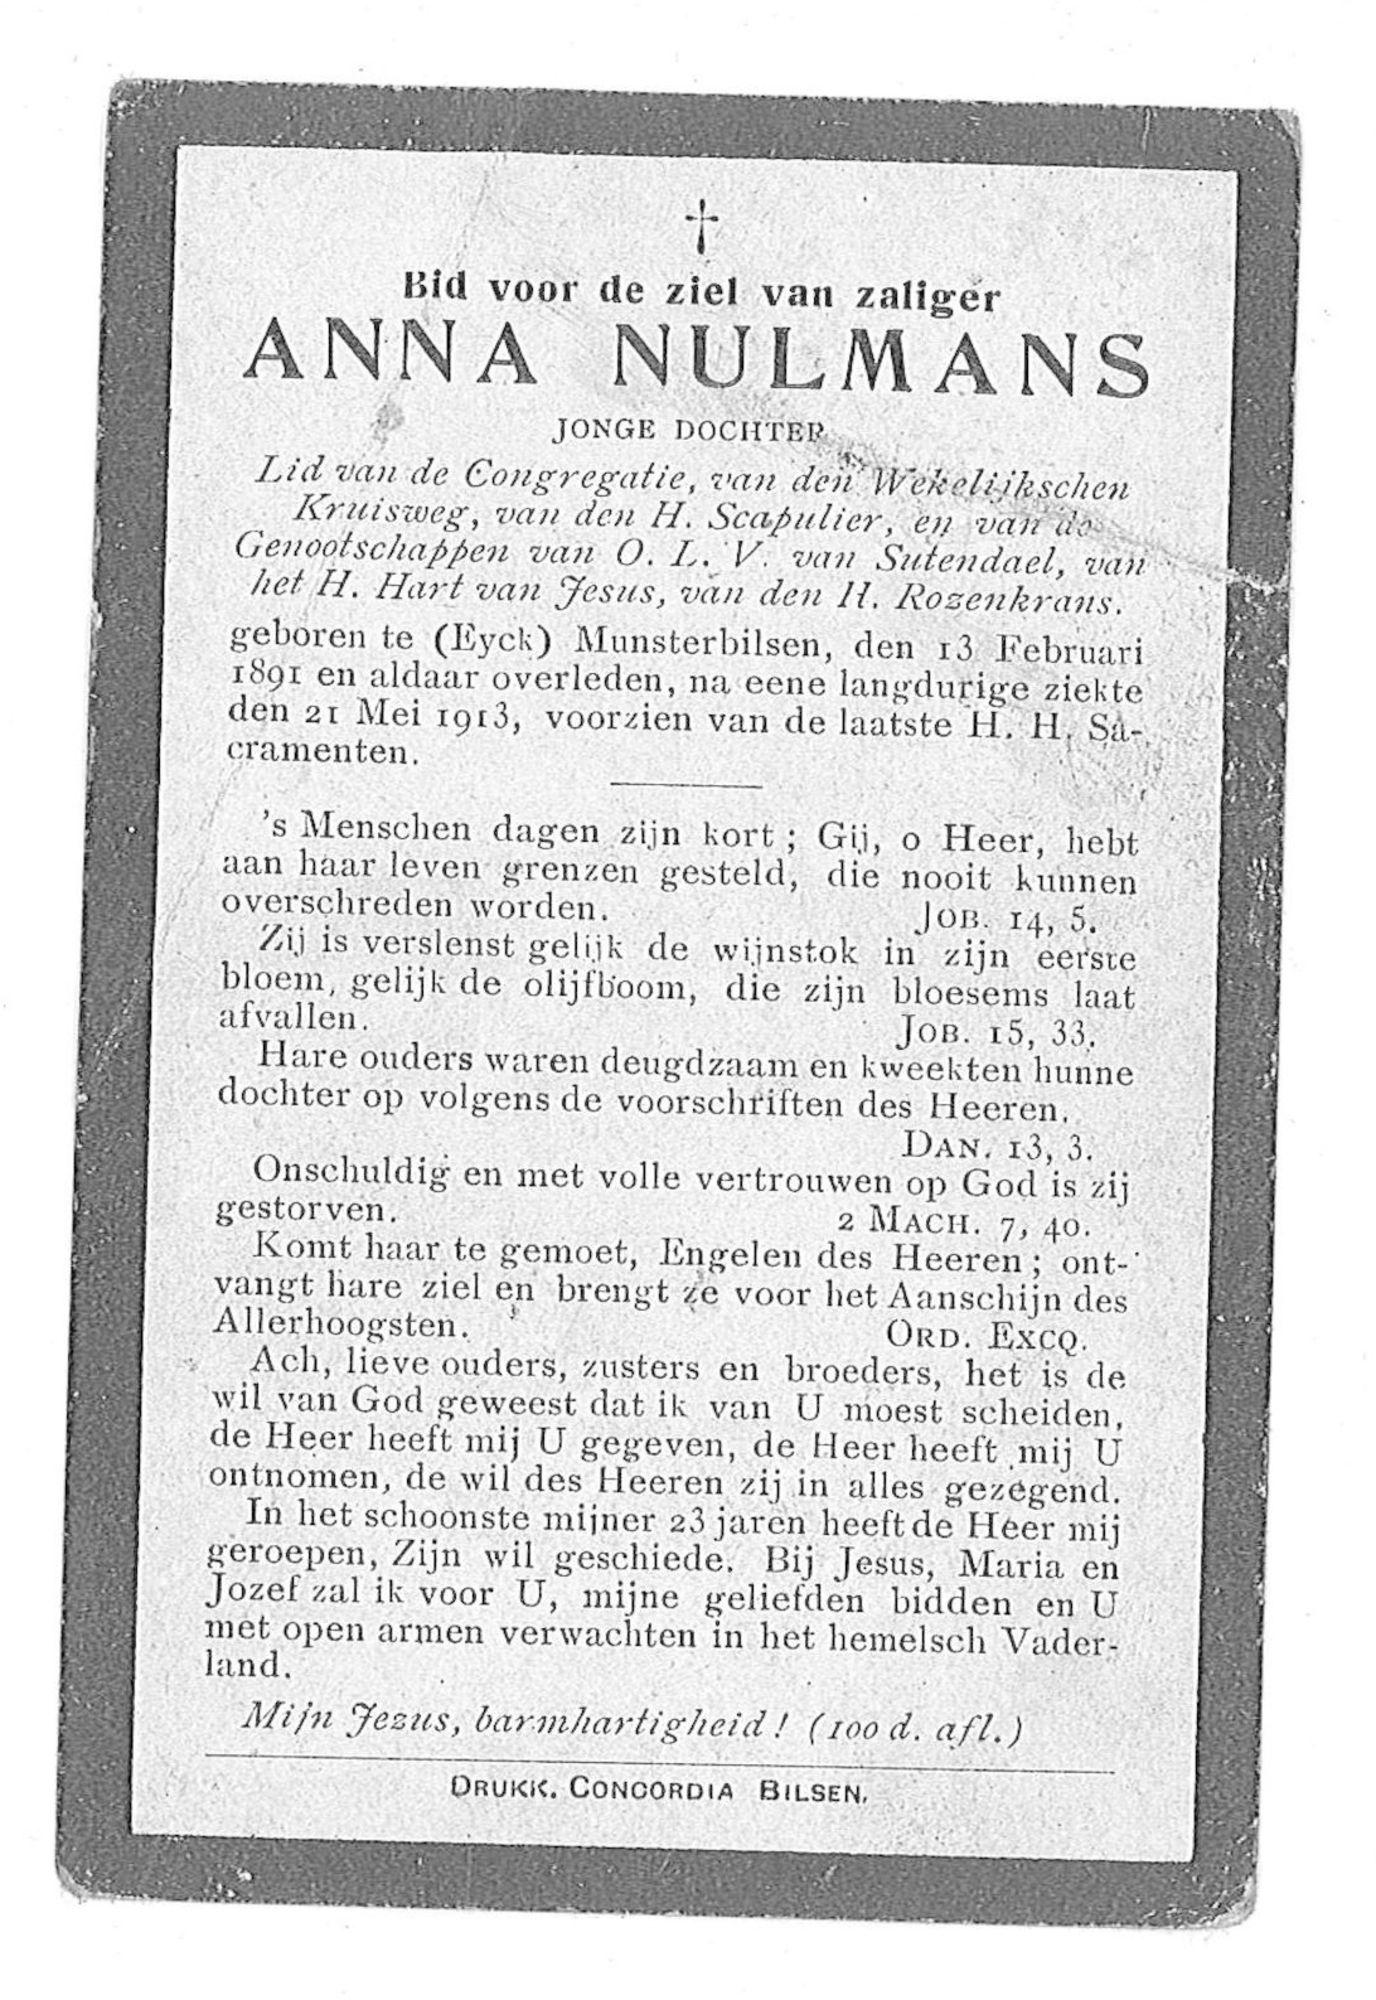 Anna Nulmans